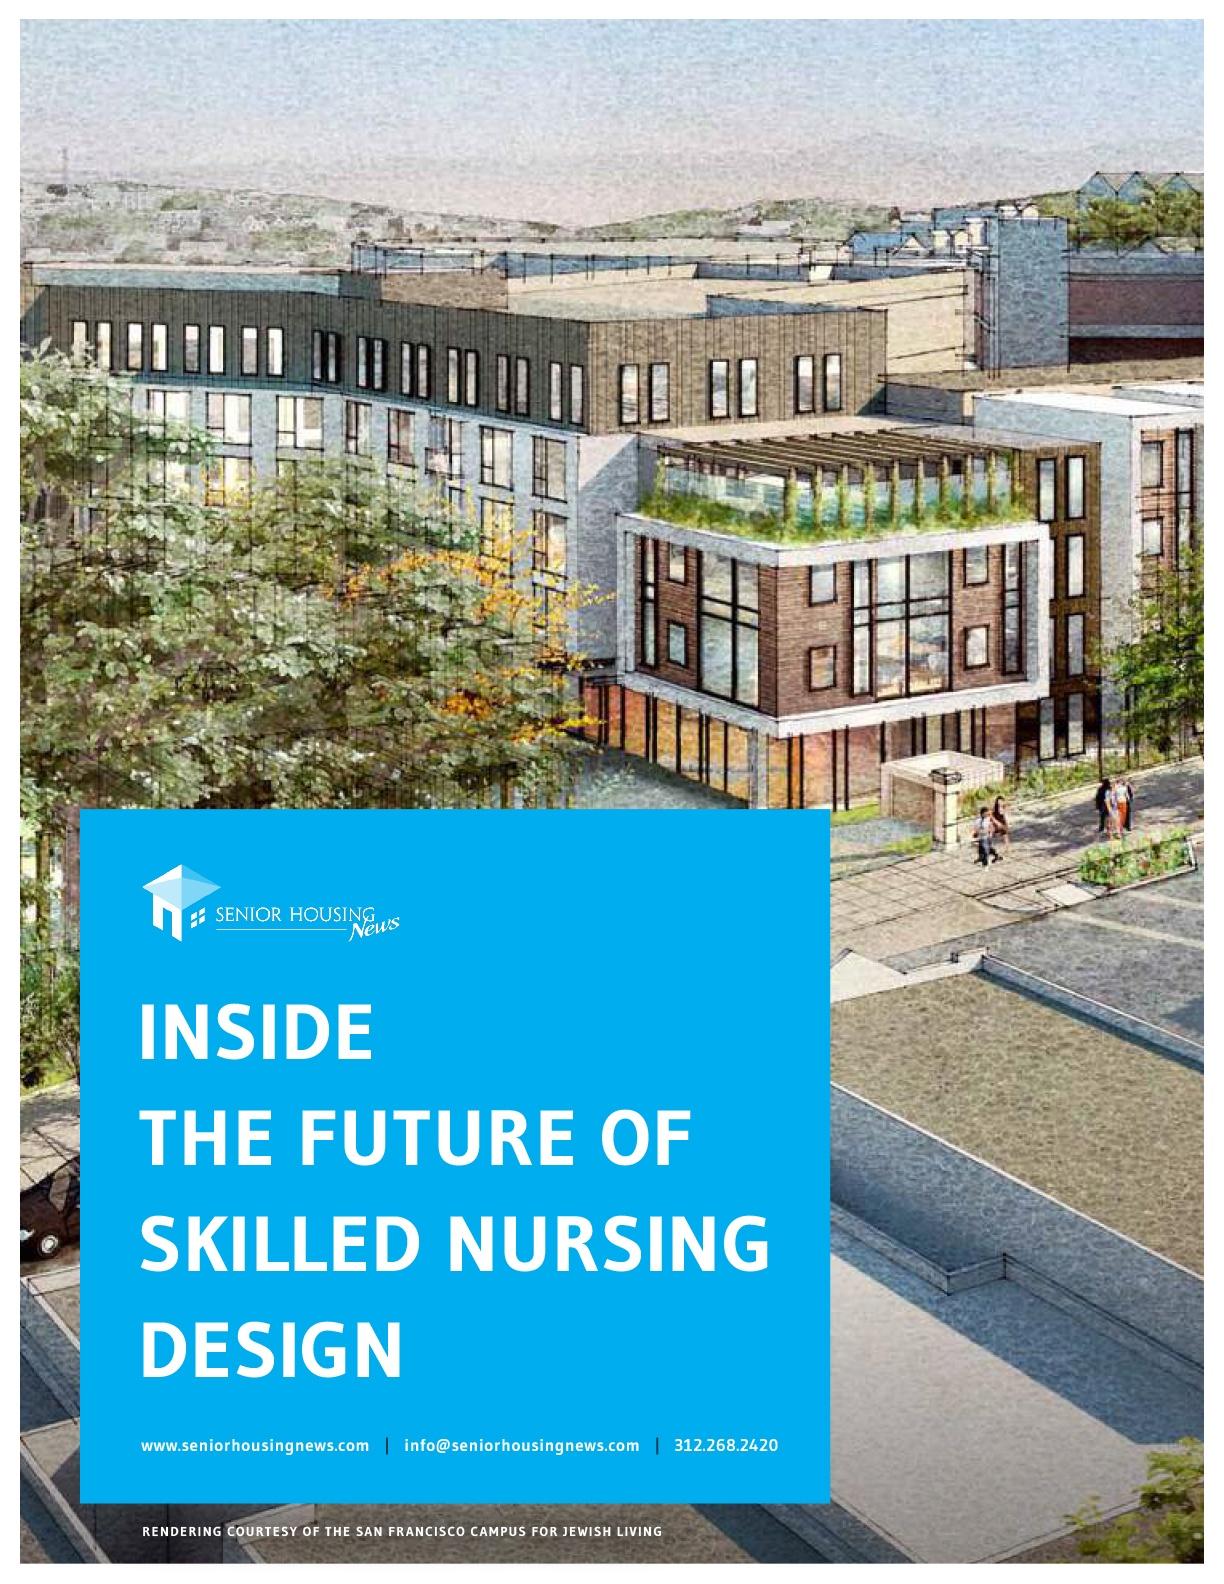 Inside The Future of Skilled Nursing Design